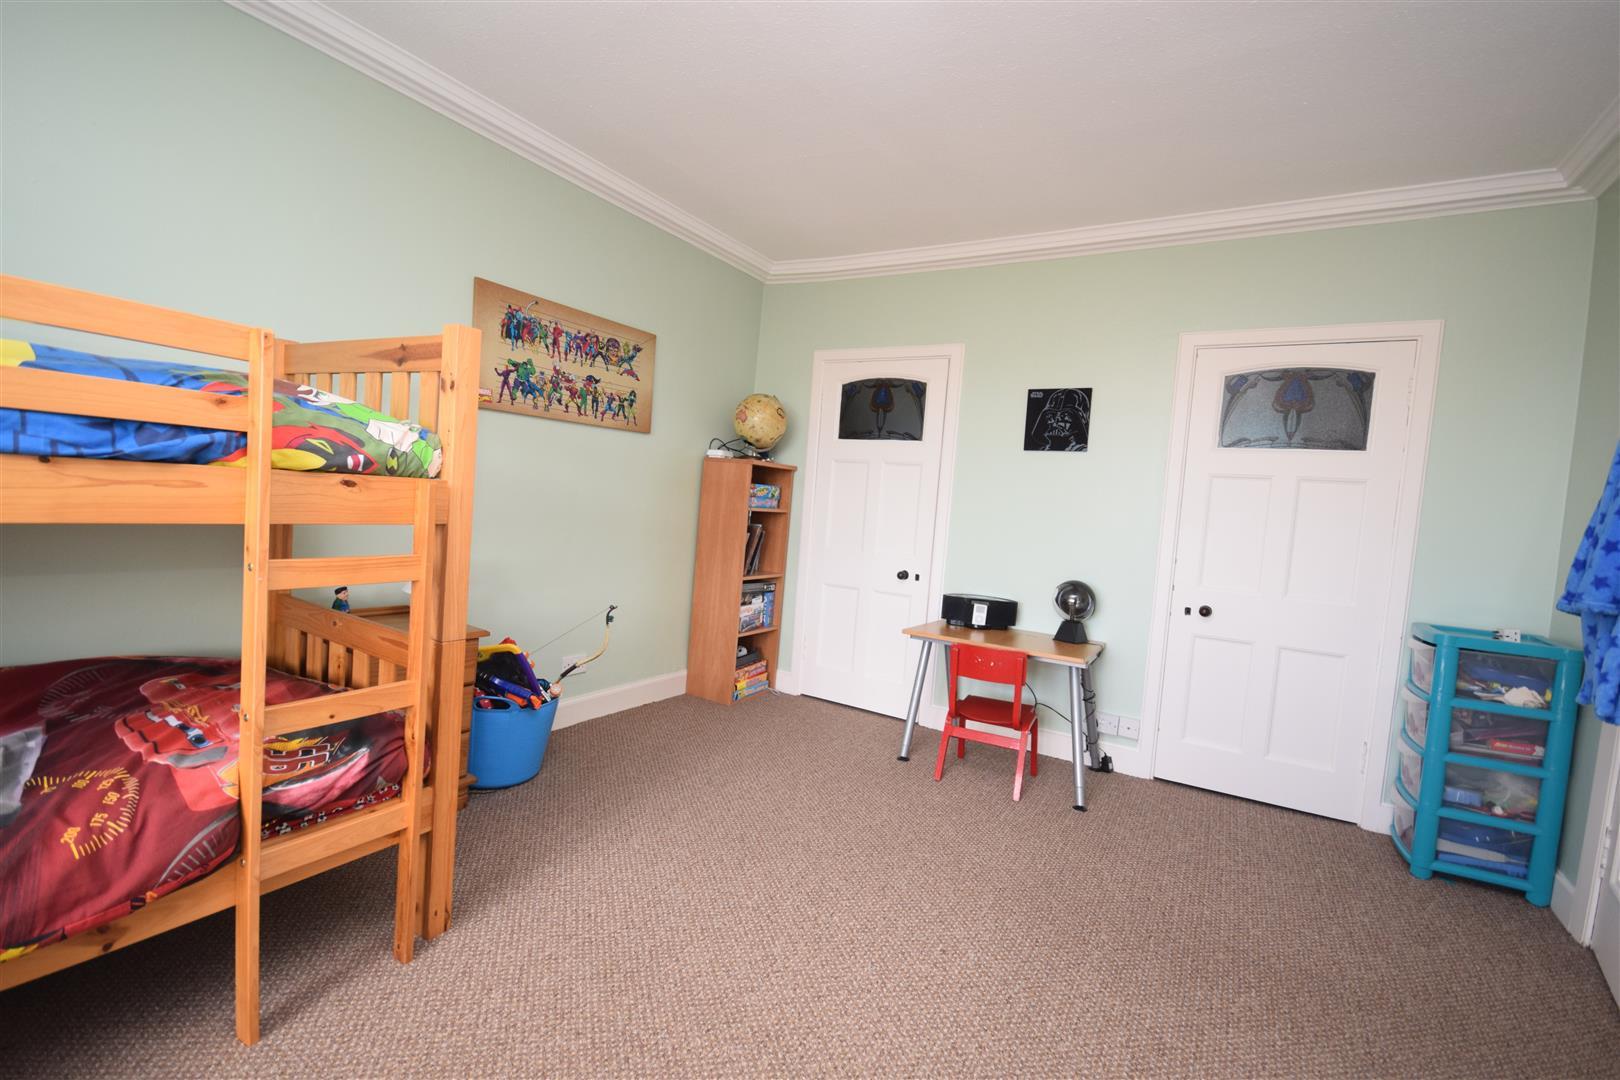 Gowanlea, Gowan Brae, Blairgowrie, Perthshire, PH10 6DW, UK